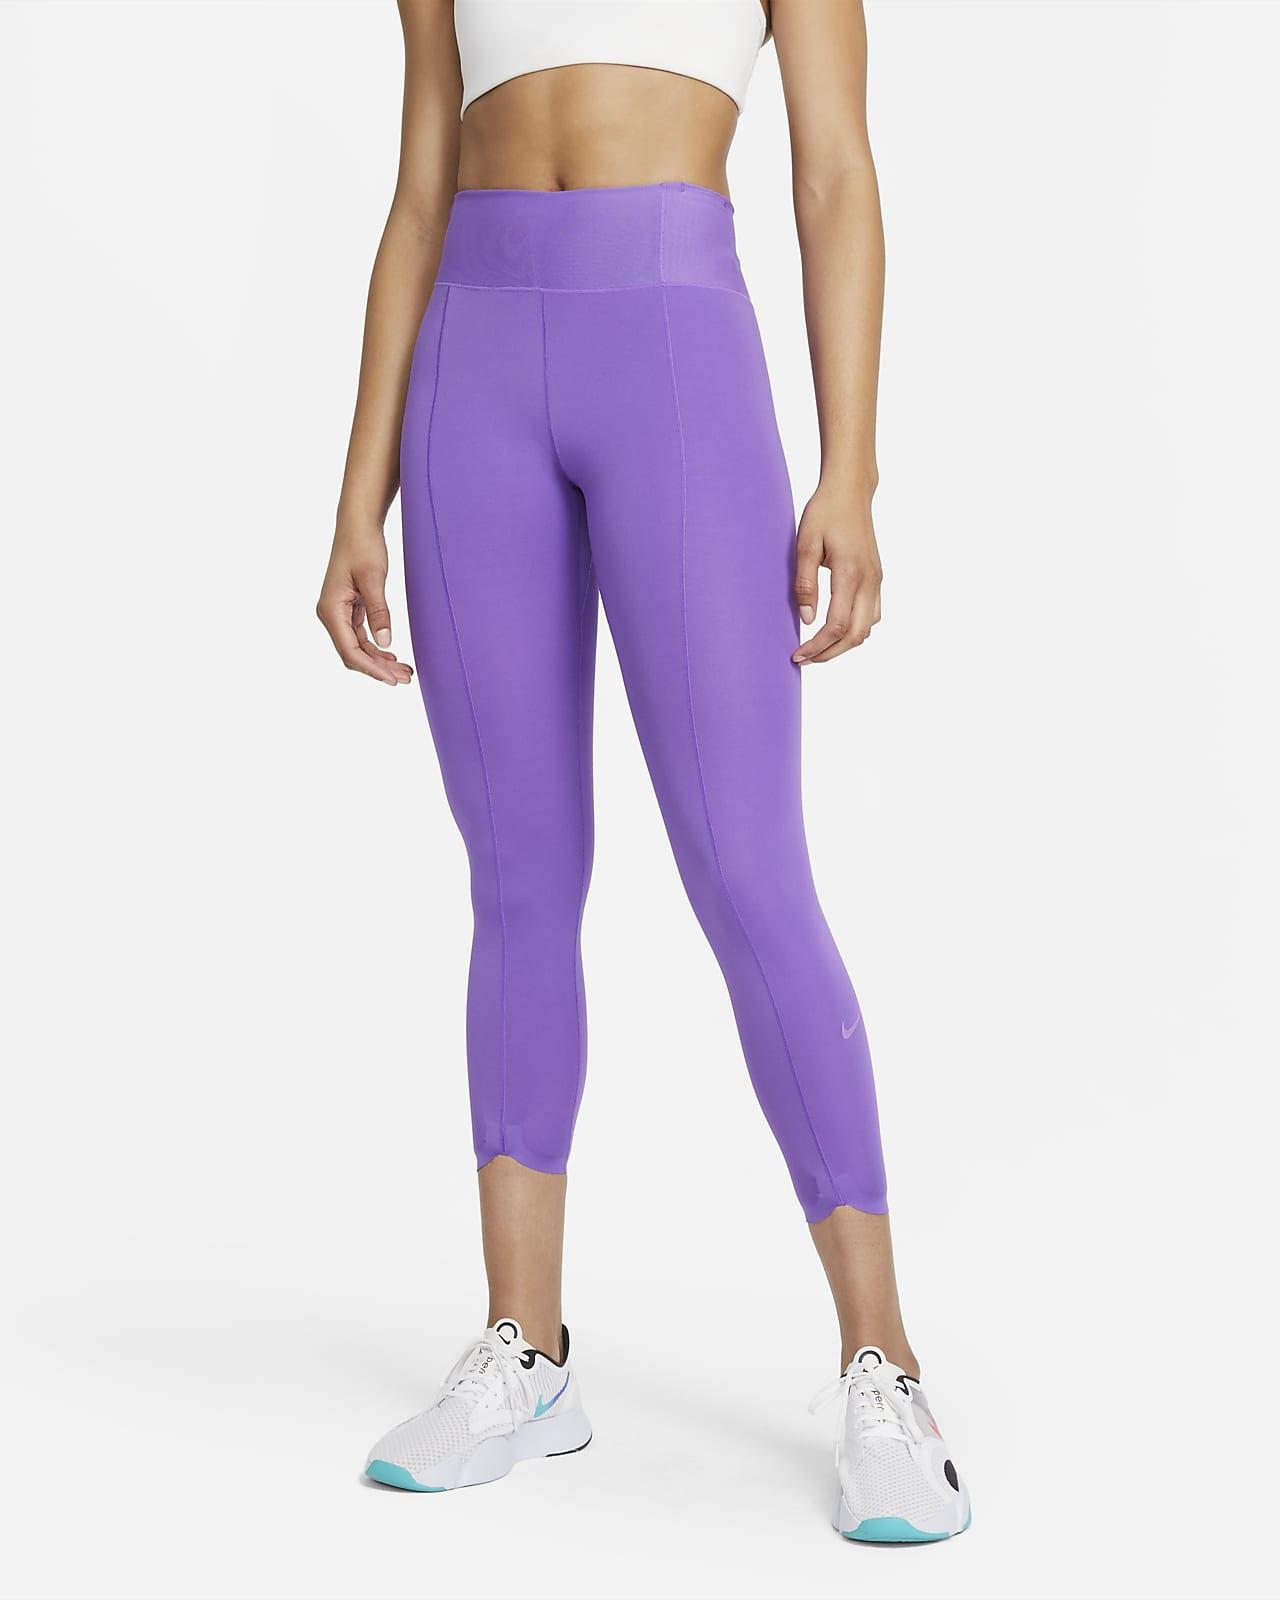 Nike One Luxe Icon Clash Kurz-Leggings für Damen